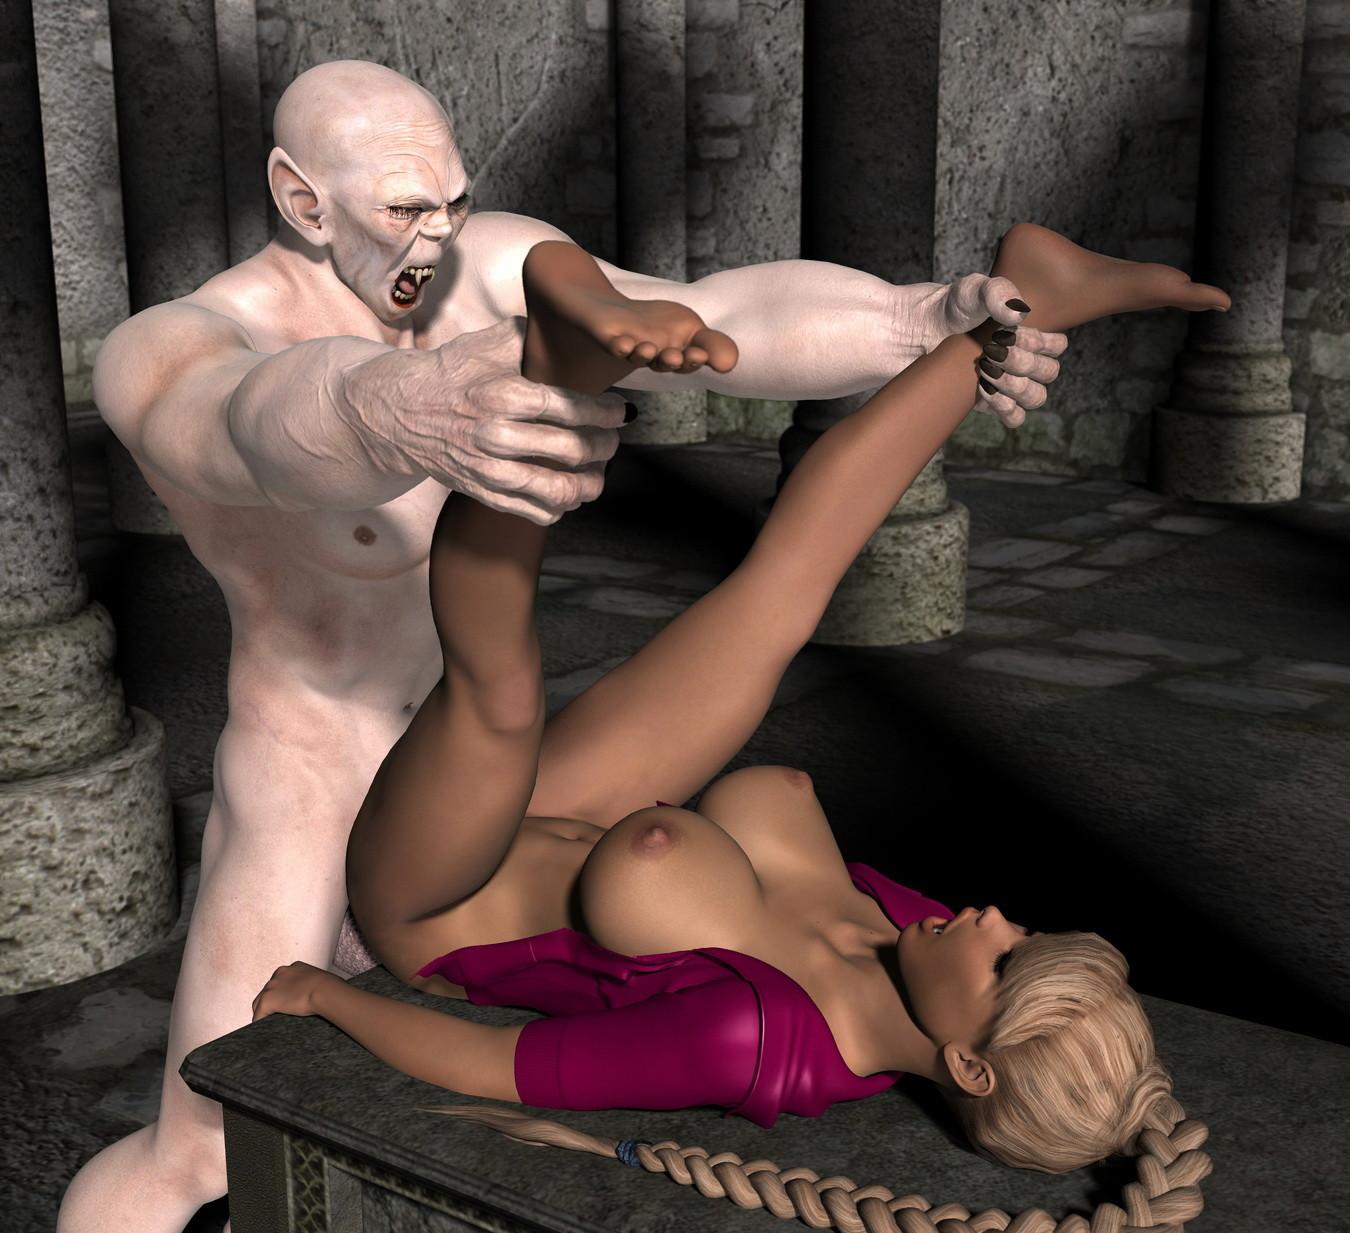 vampires-girl-hard-xxx-sex-pic